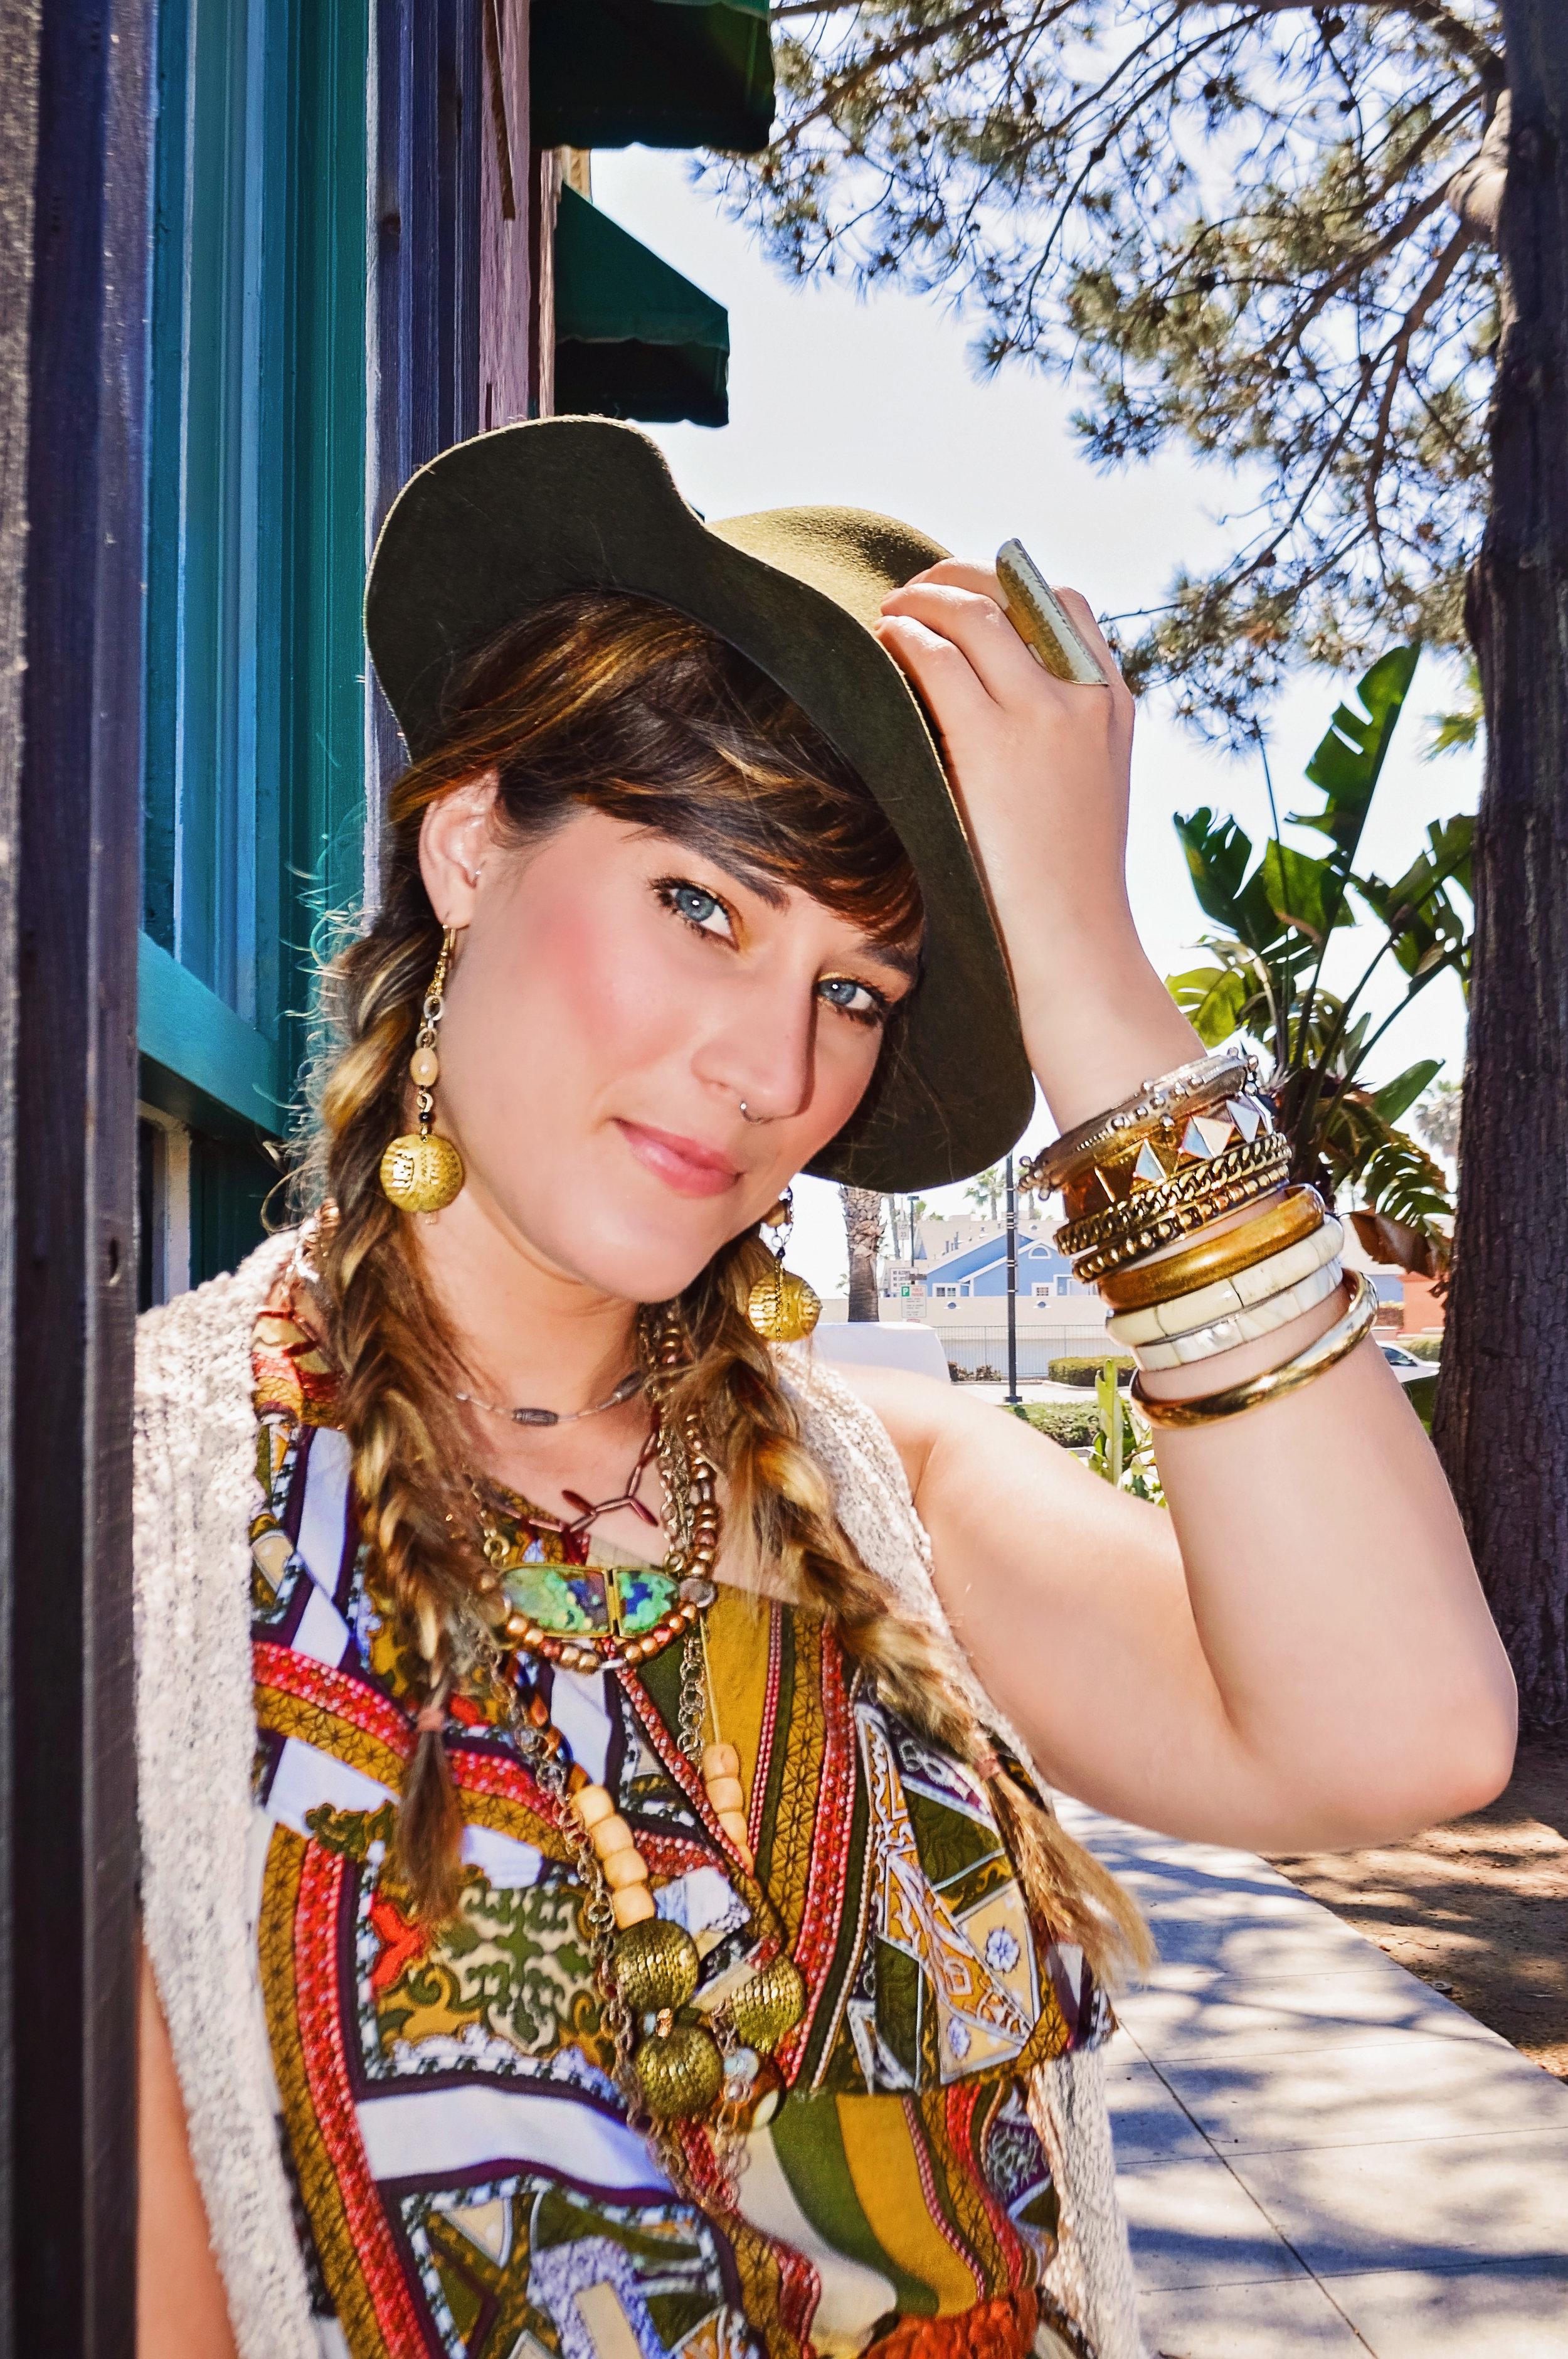 Fashion Models Jewelry Hat | Fashion Photography | Lacey O | Washington DC